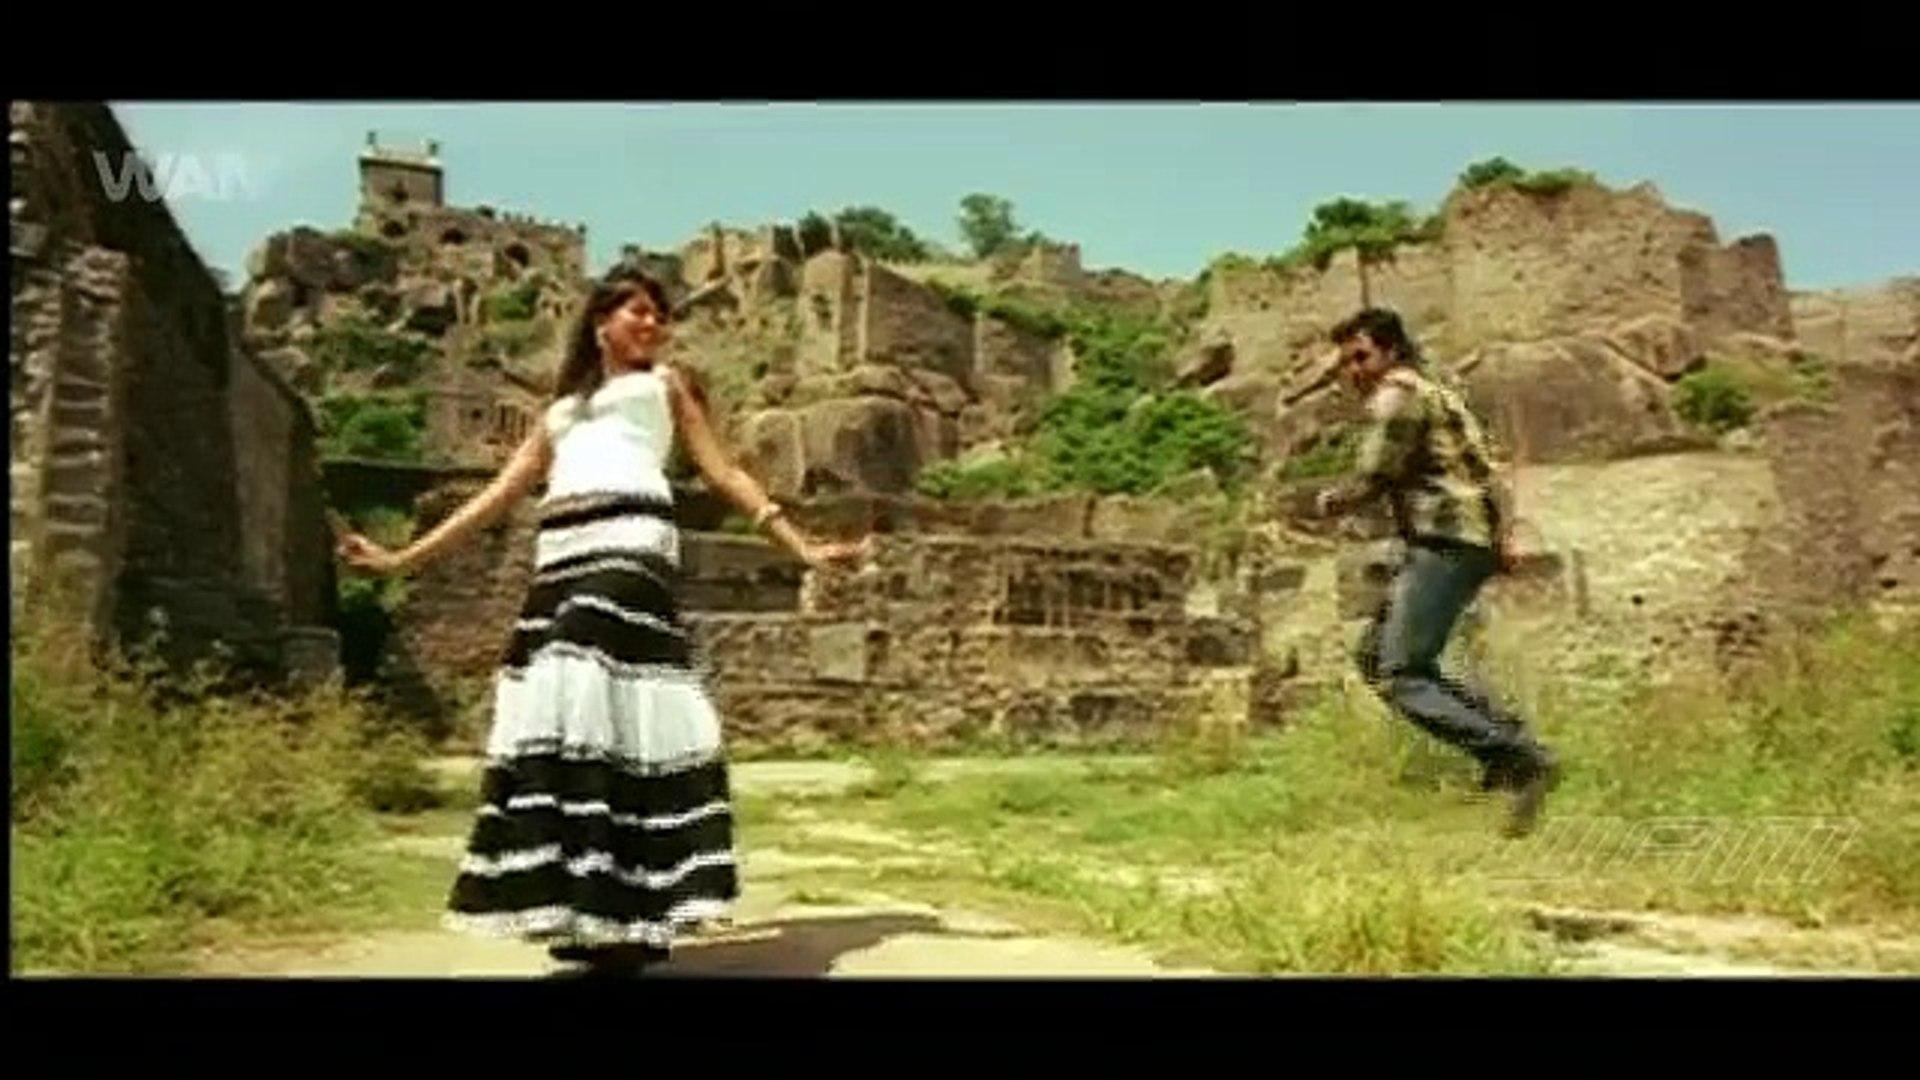 Rahasya (2017) | New Hindi dubbed Full Movie 2017 | South Movie dubbed in Hindi Full Movie